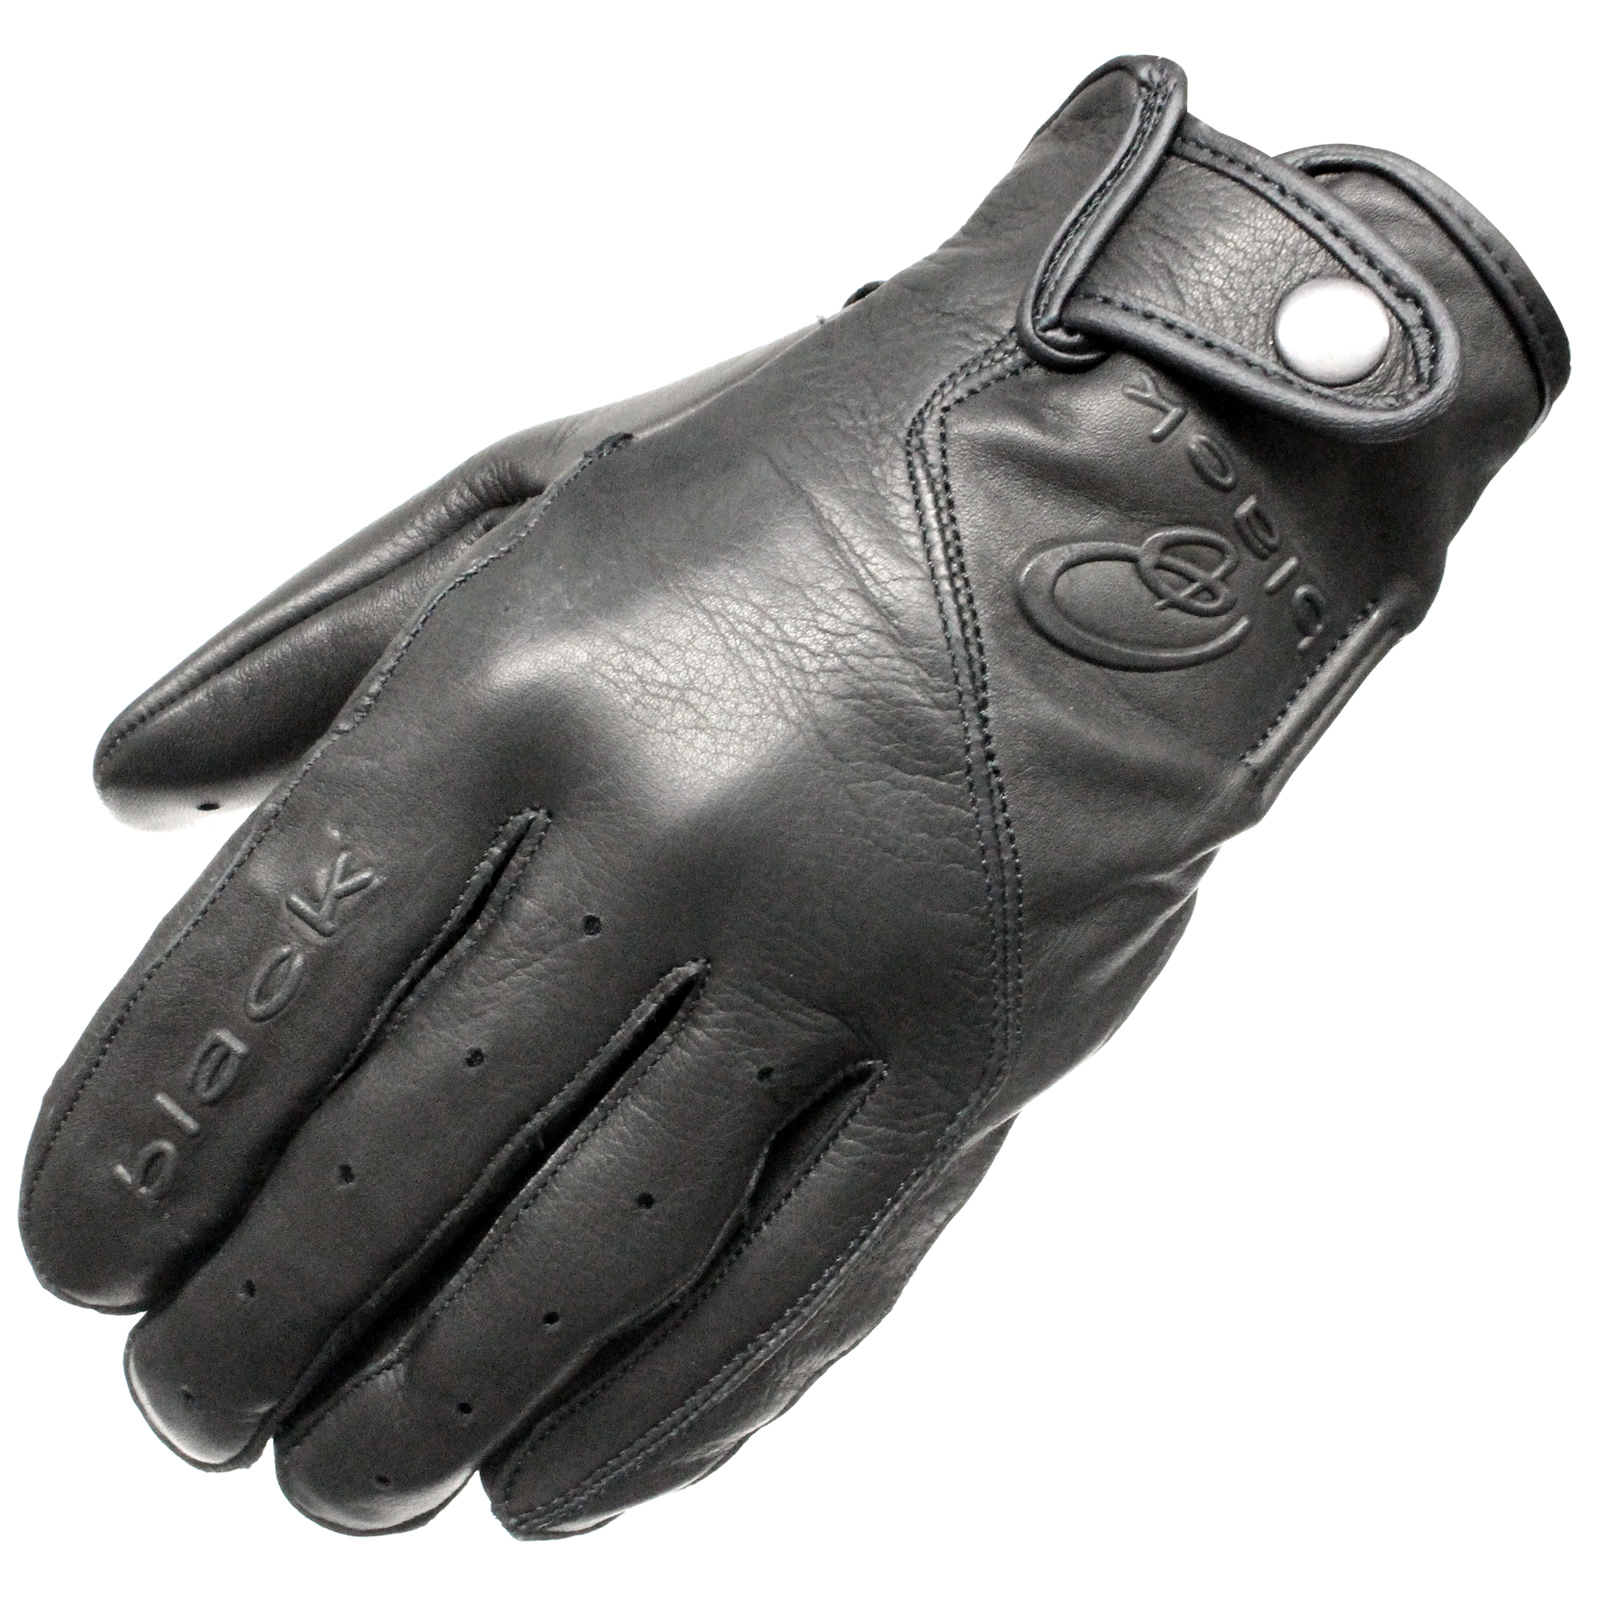 Motorcycle gloves singapore - Black Static Leather Classic Vintage Fashion Motorcycle Motorbike